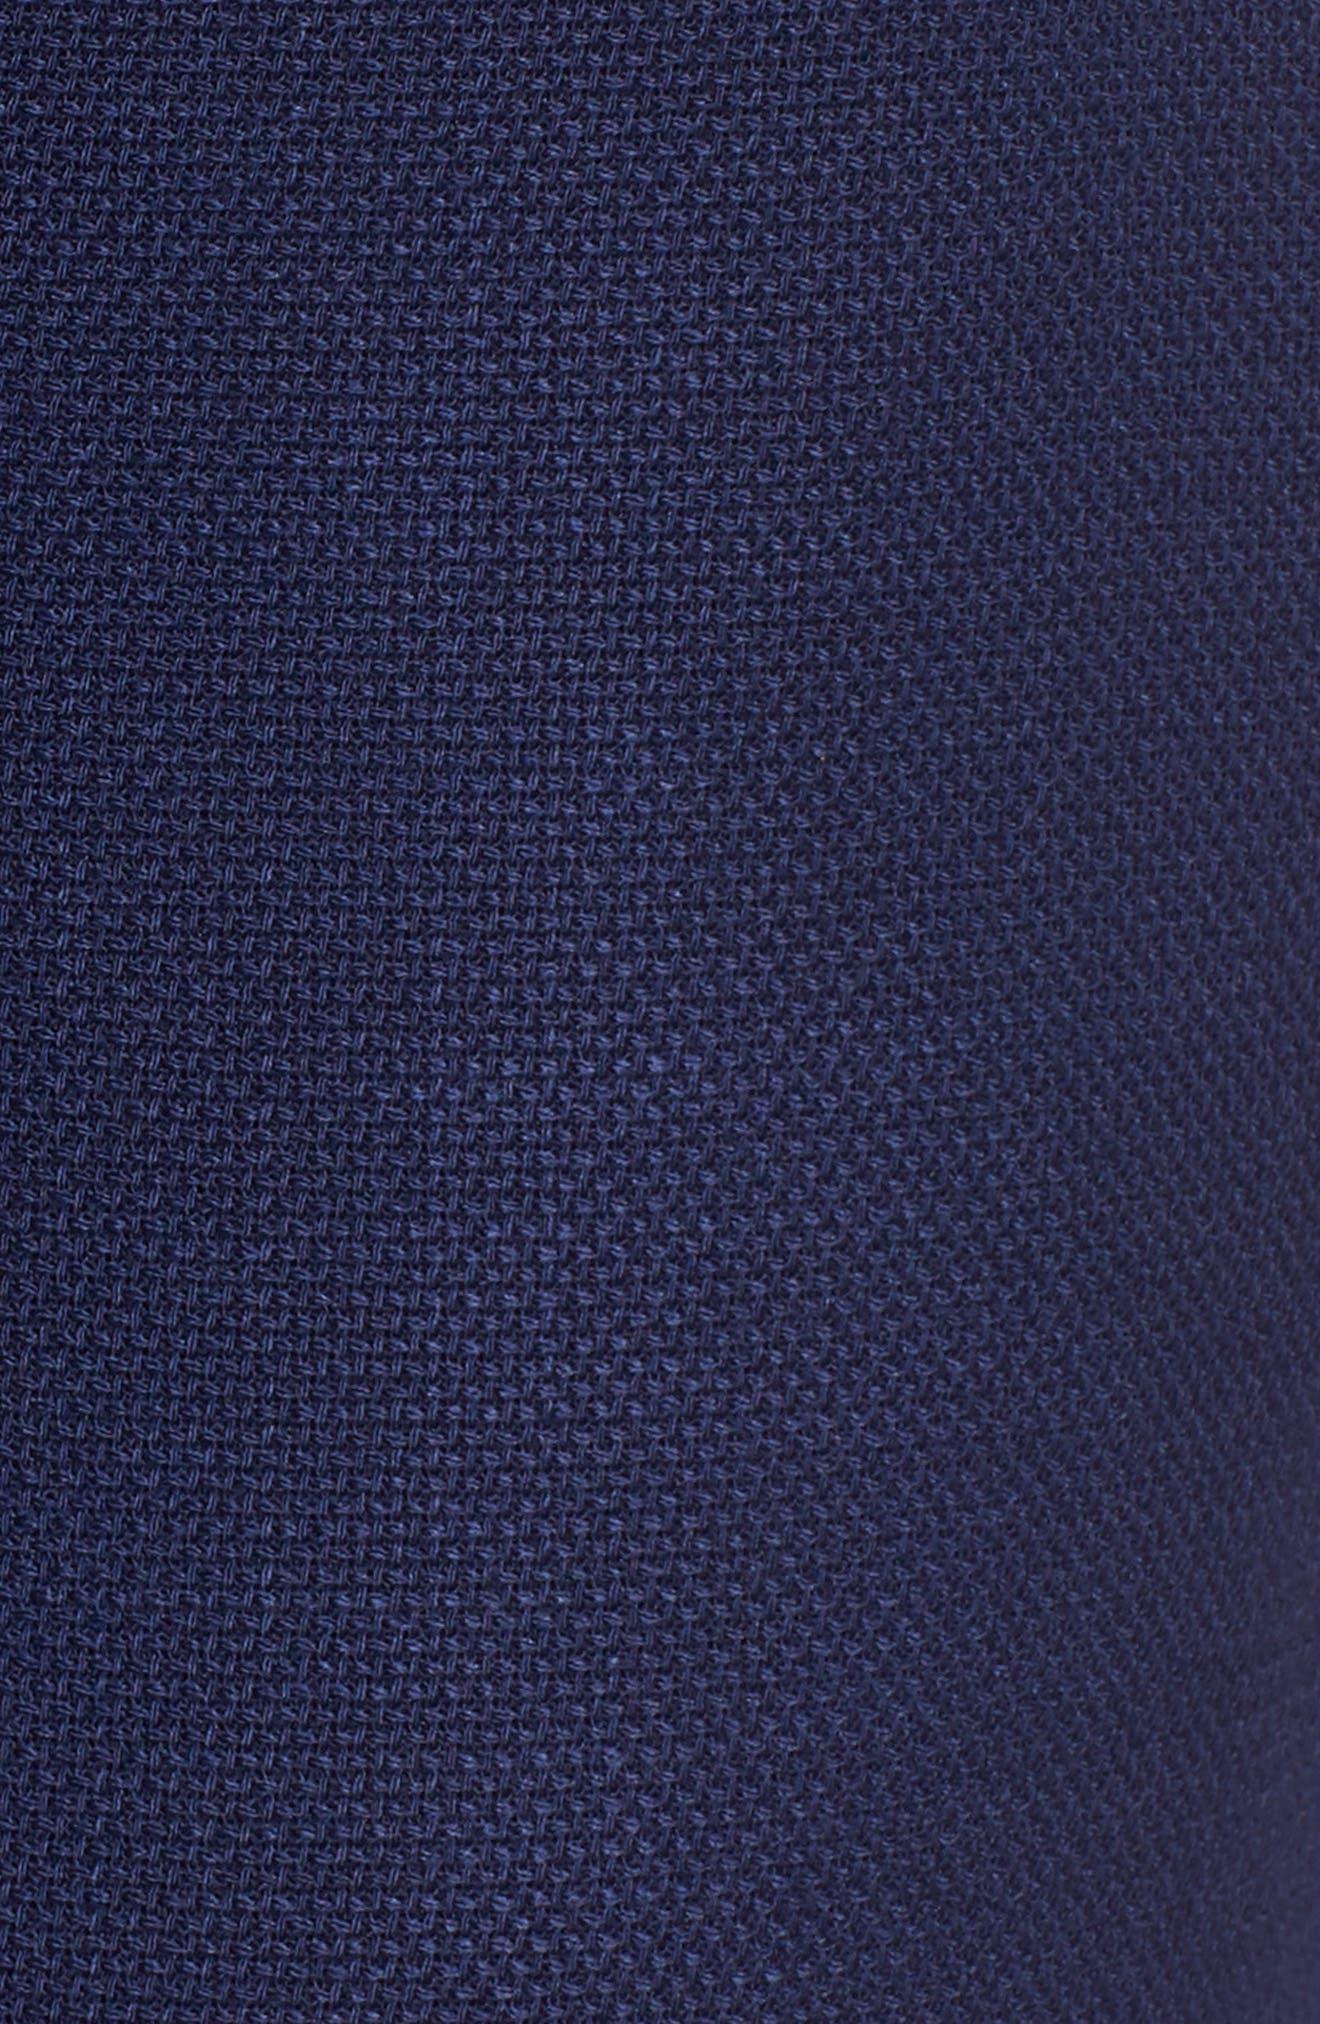 Tibalena Textured Stretch Wool Suit Pants,                             Alternate thumbnail 6, color,                             425